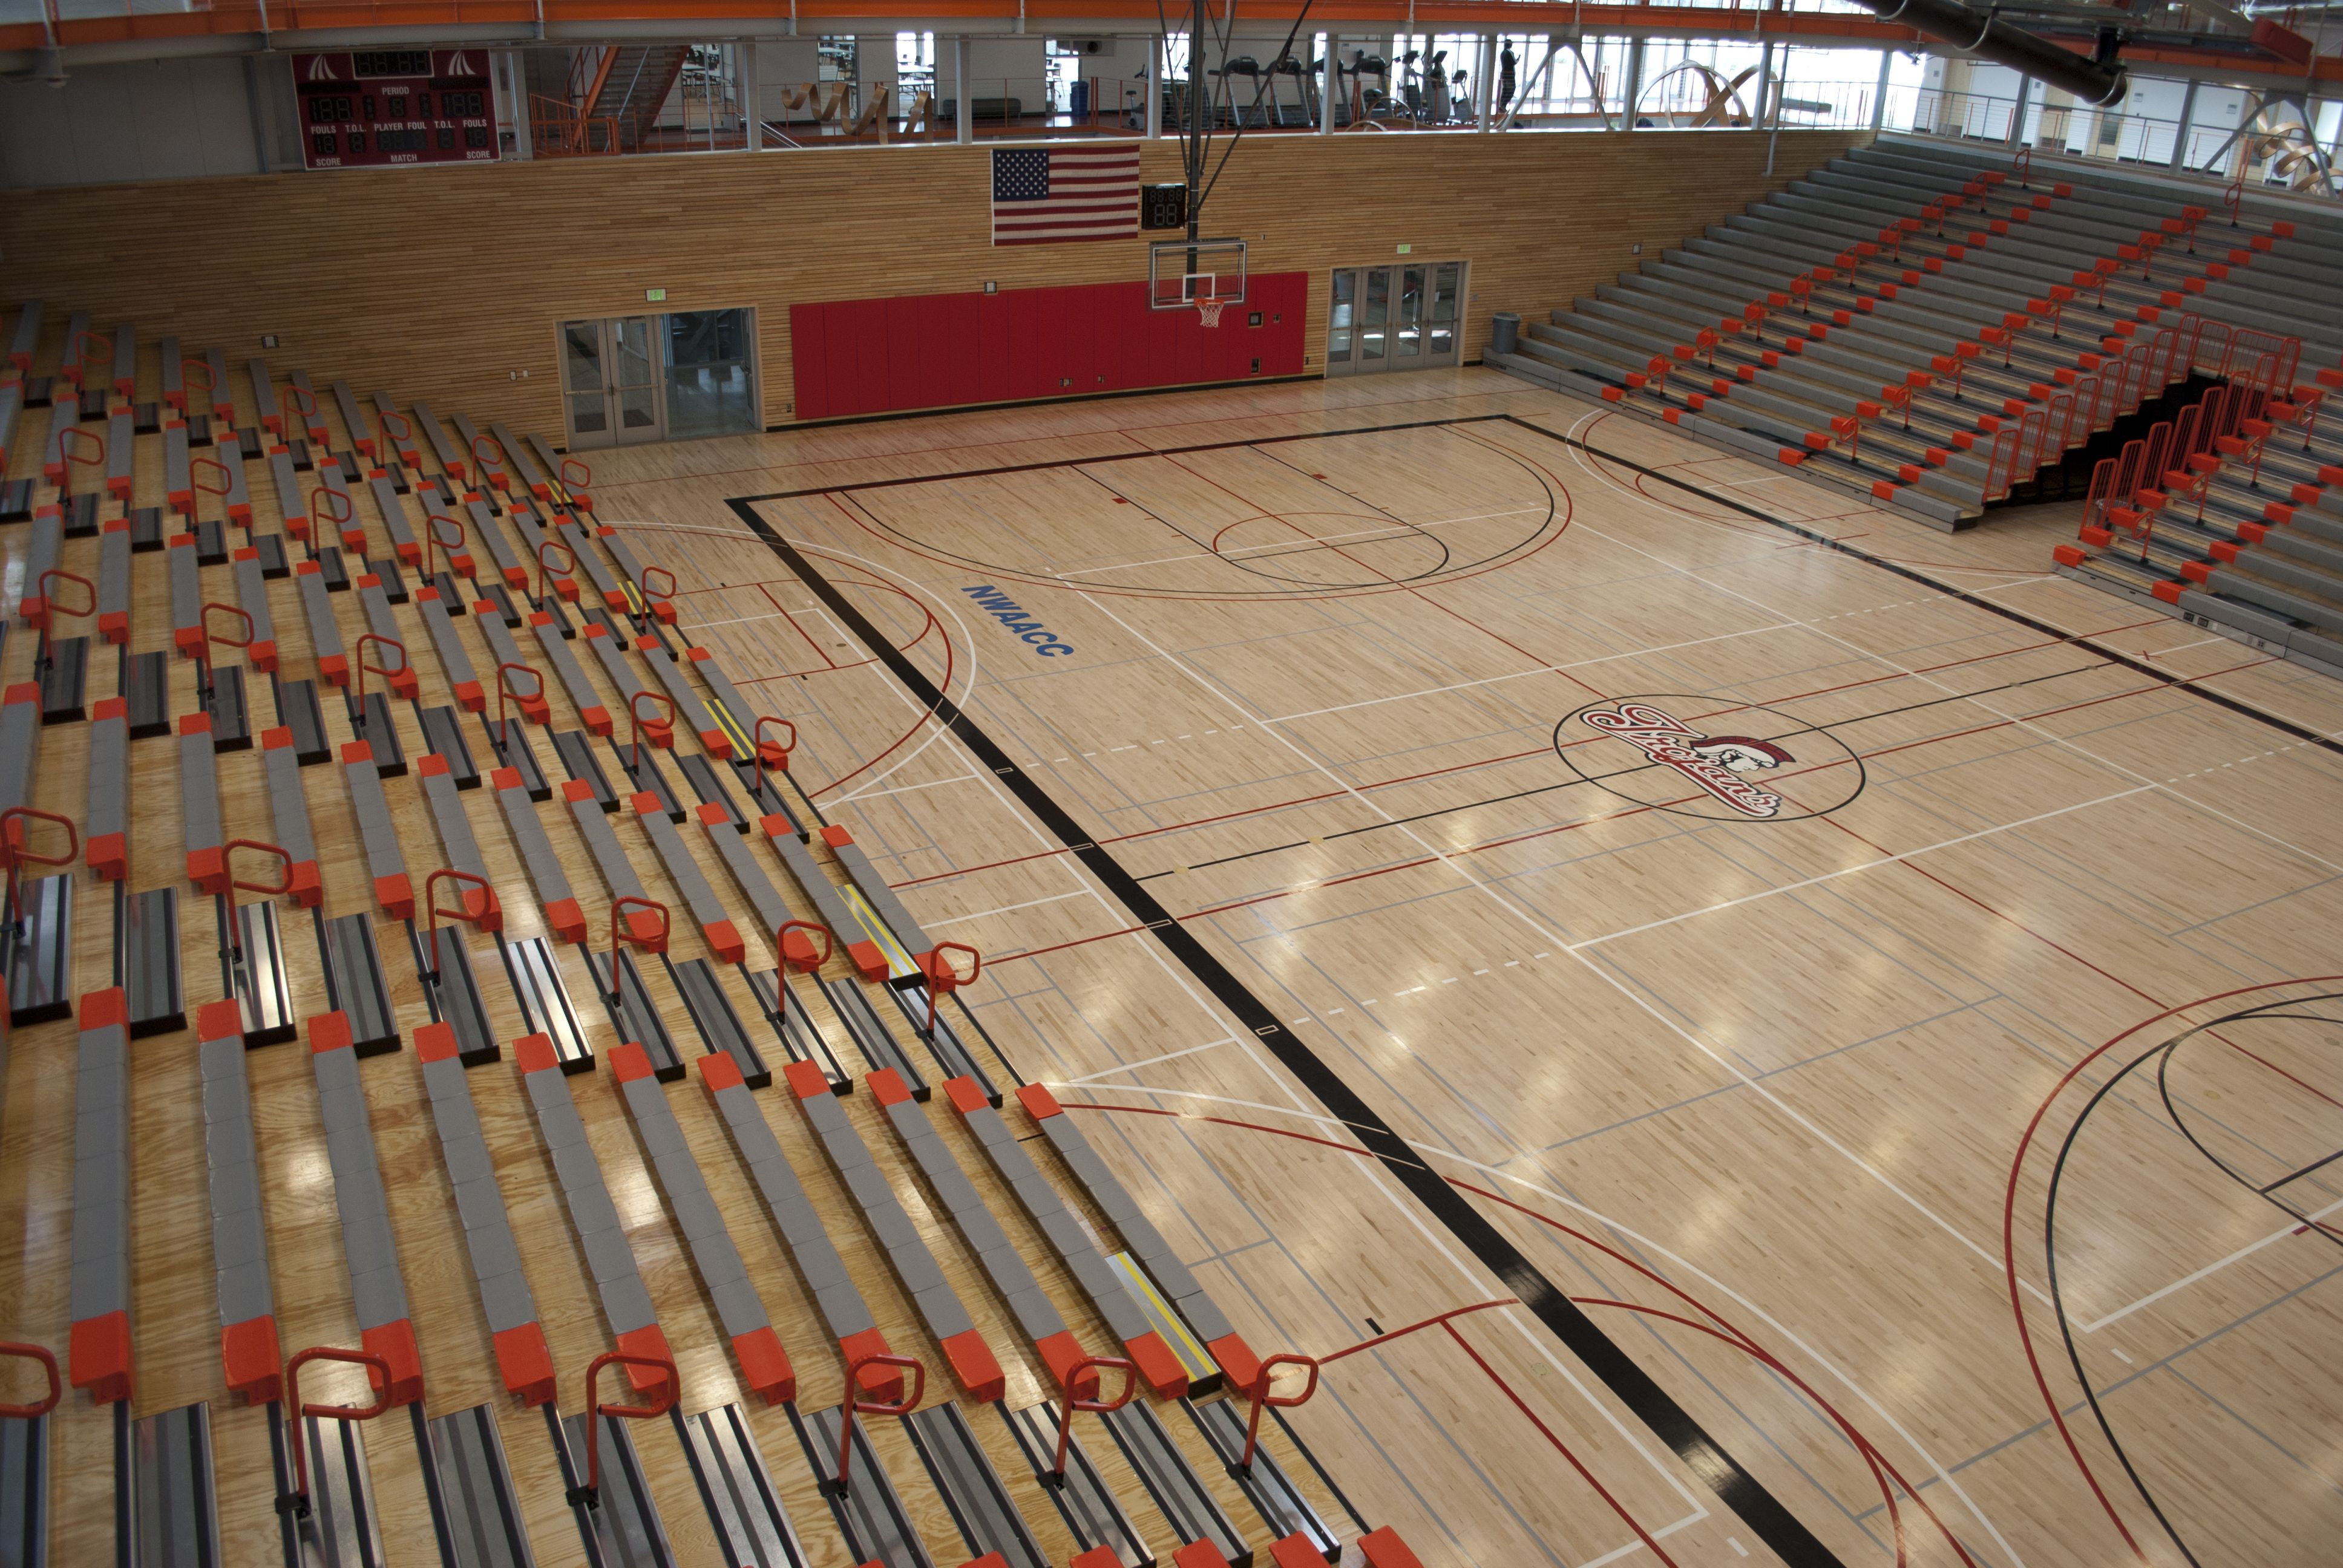 Everett Community College Student Fitness Center The Student Fitness Center Features A Full College Student Fitness Community College Gymnasium Architecture